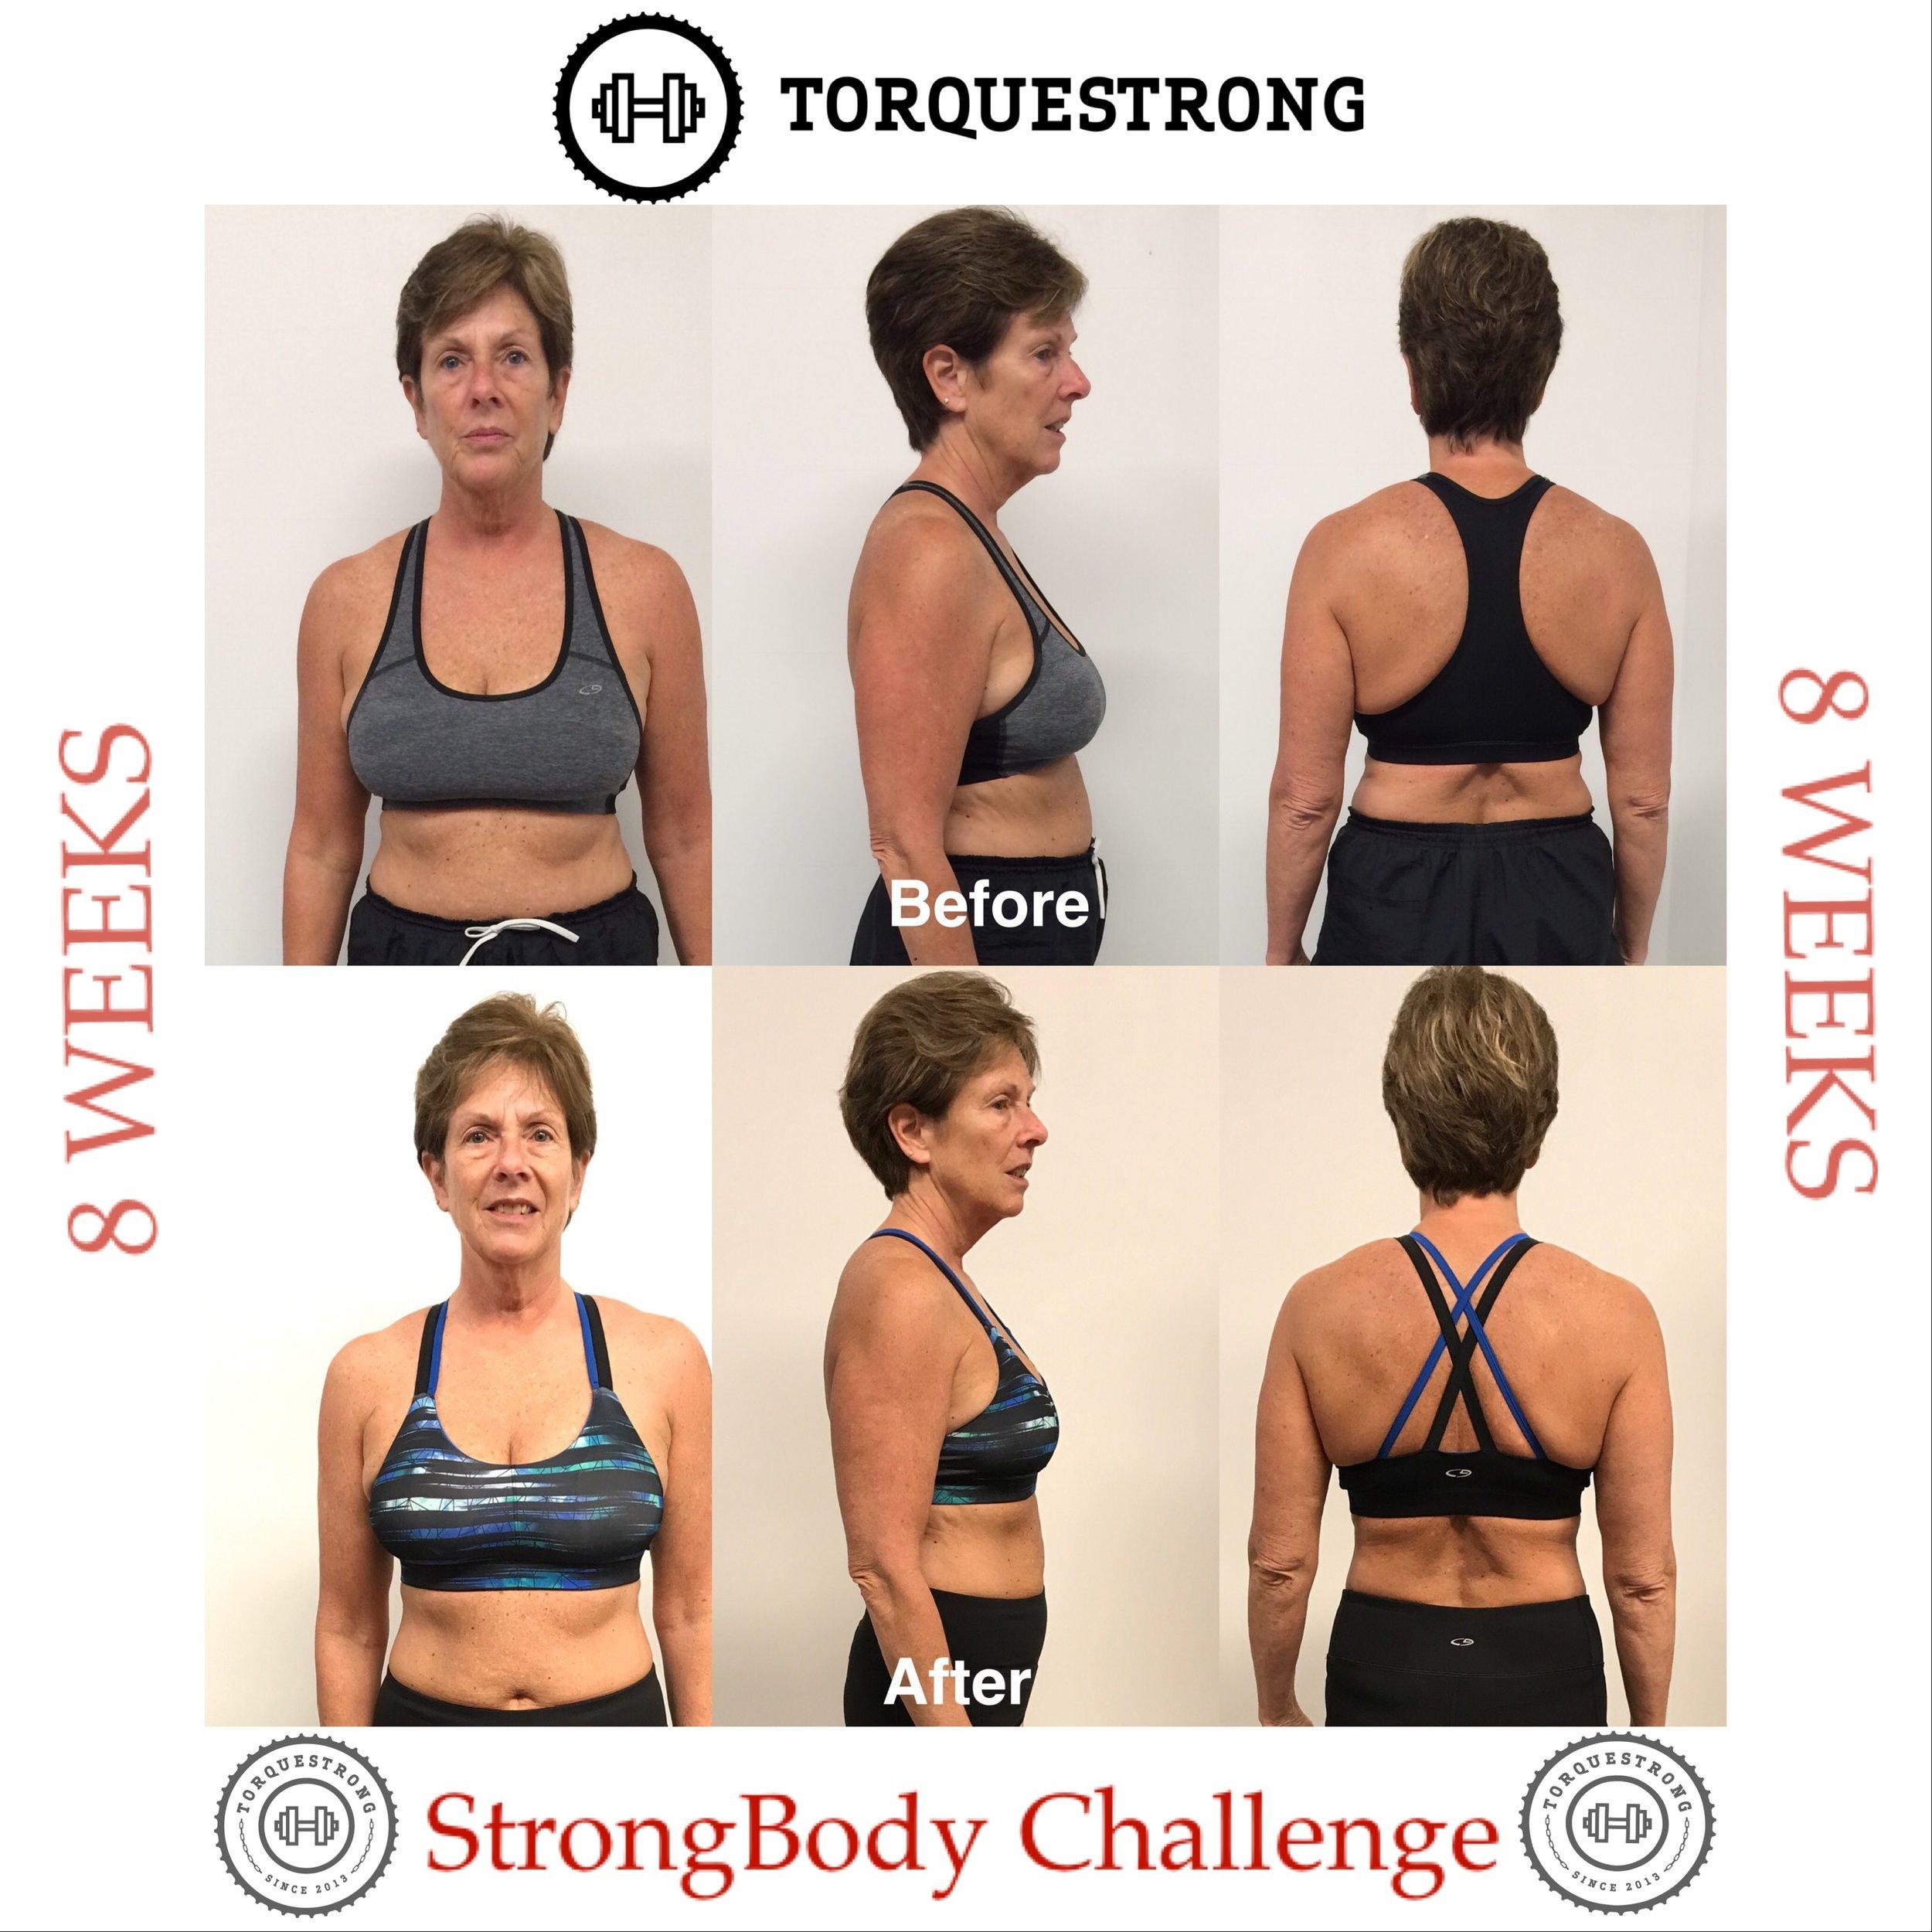 StrongBodyChallenge. Linda. Moore. Lynchburg Va. Personal Training